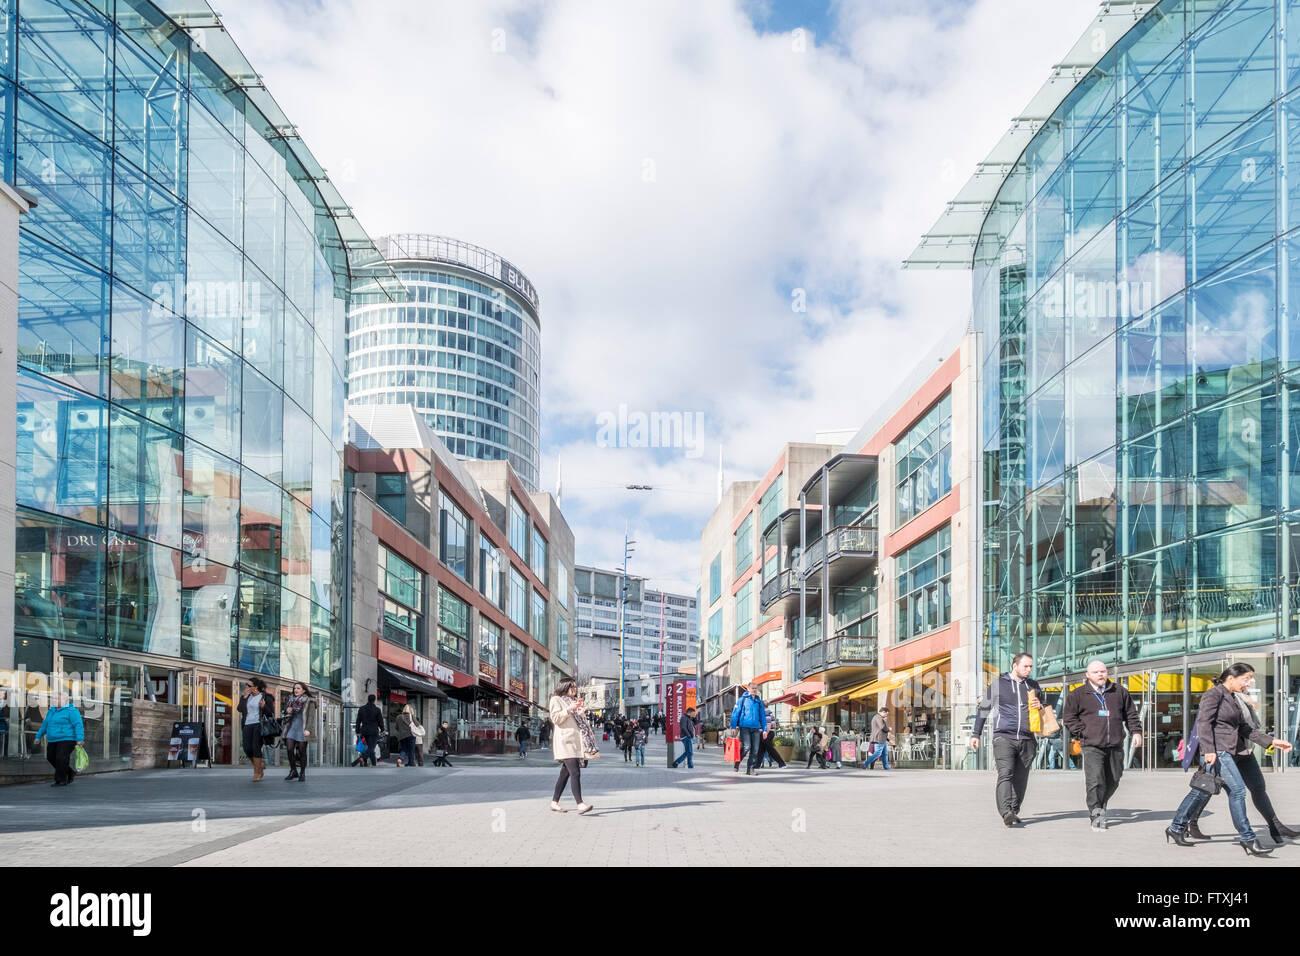 The Bullring Shopping Centre, Birmingham. - Stock Image